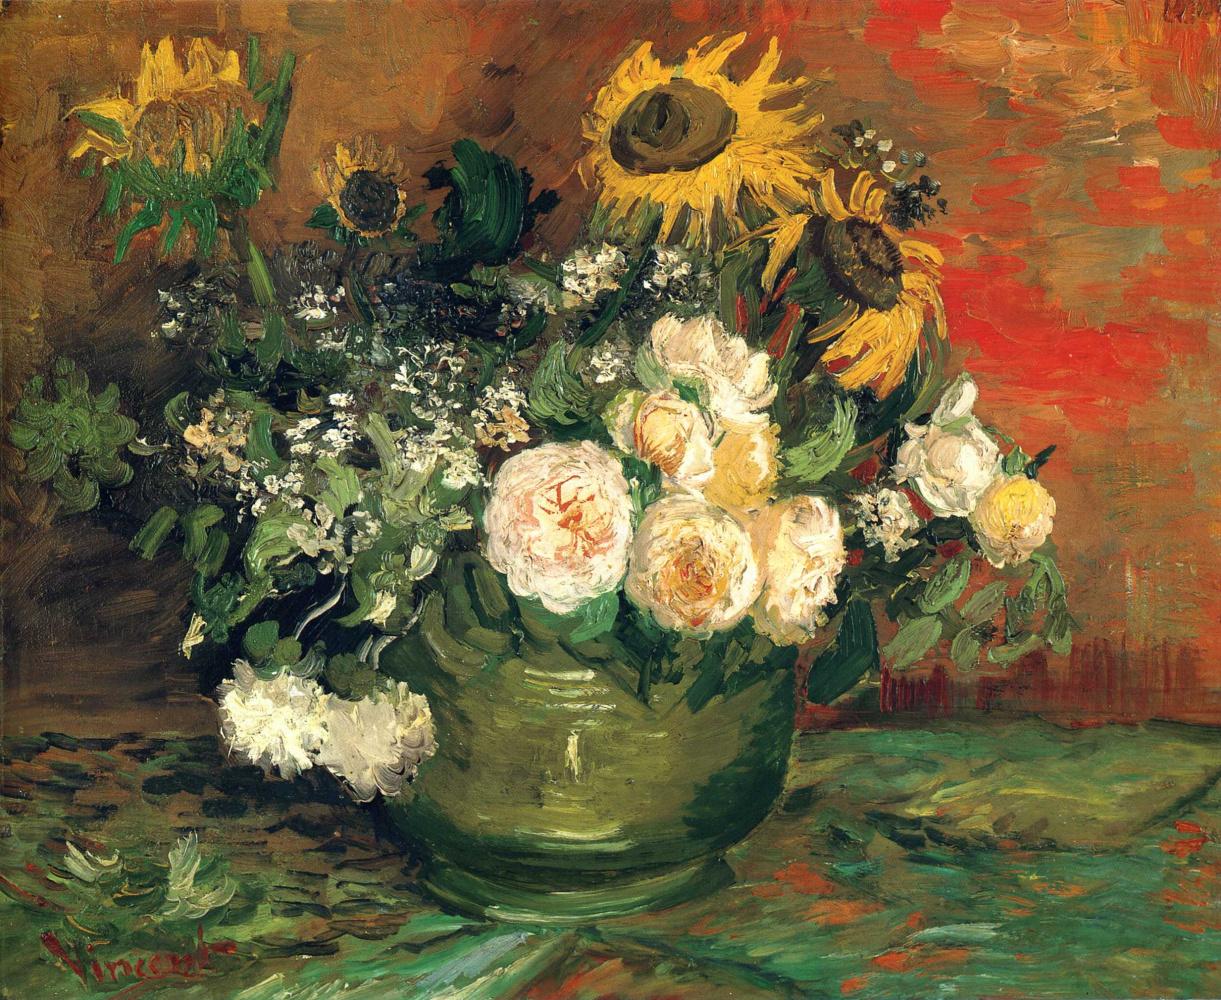 Винсент Ван Гог. Чаша с розами и подсолнухами и другими цветами